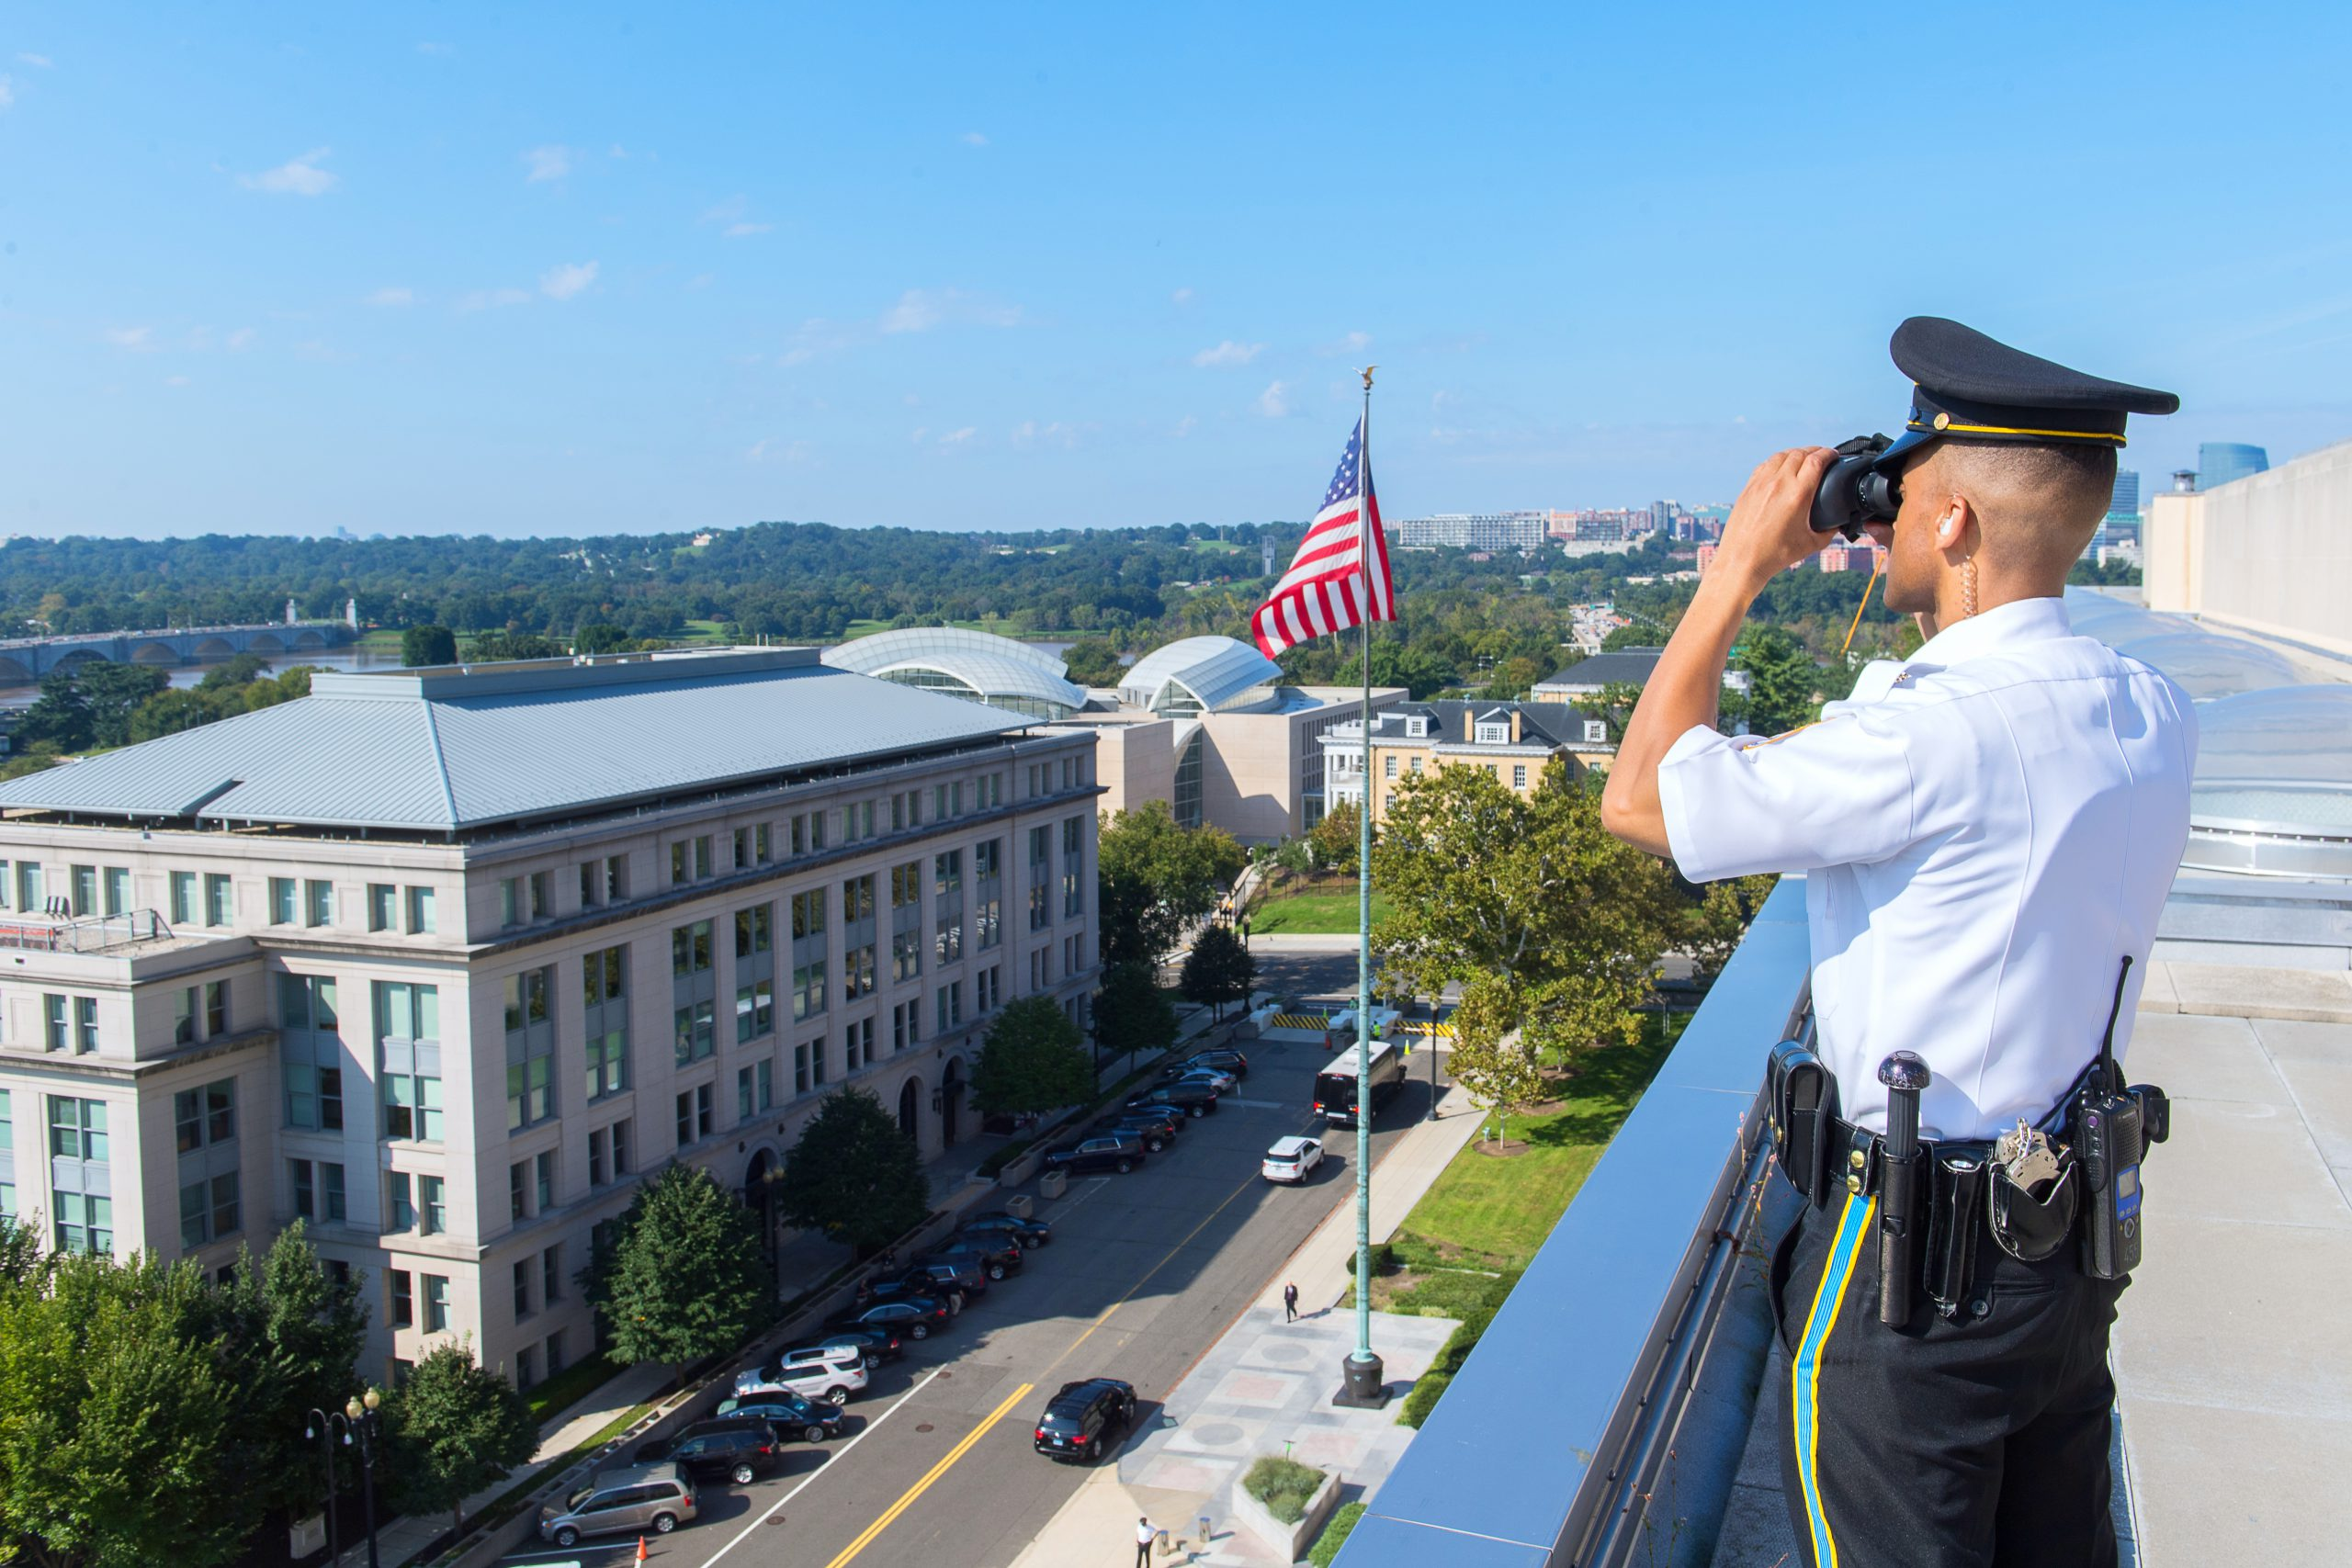 Security Officer looking through binoculars on top of building